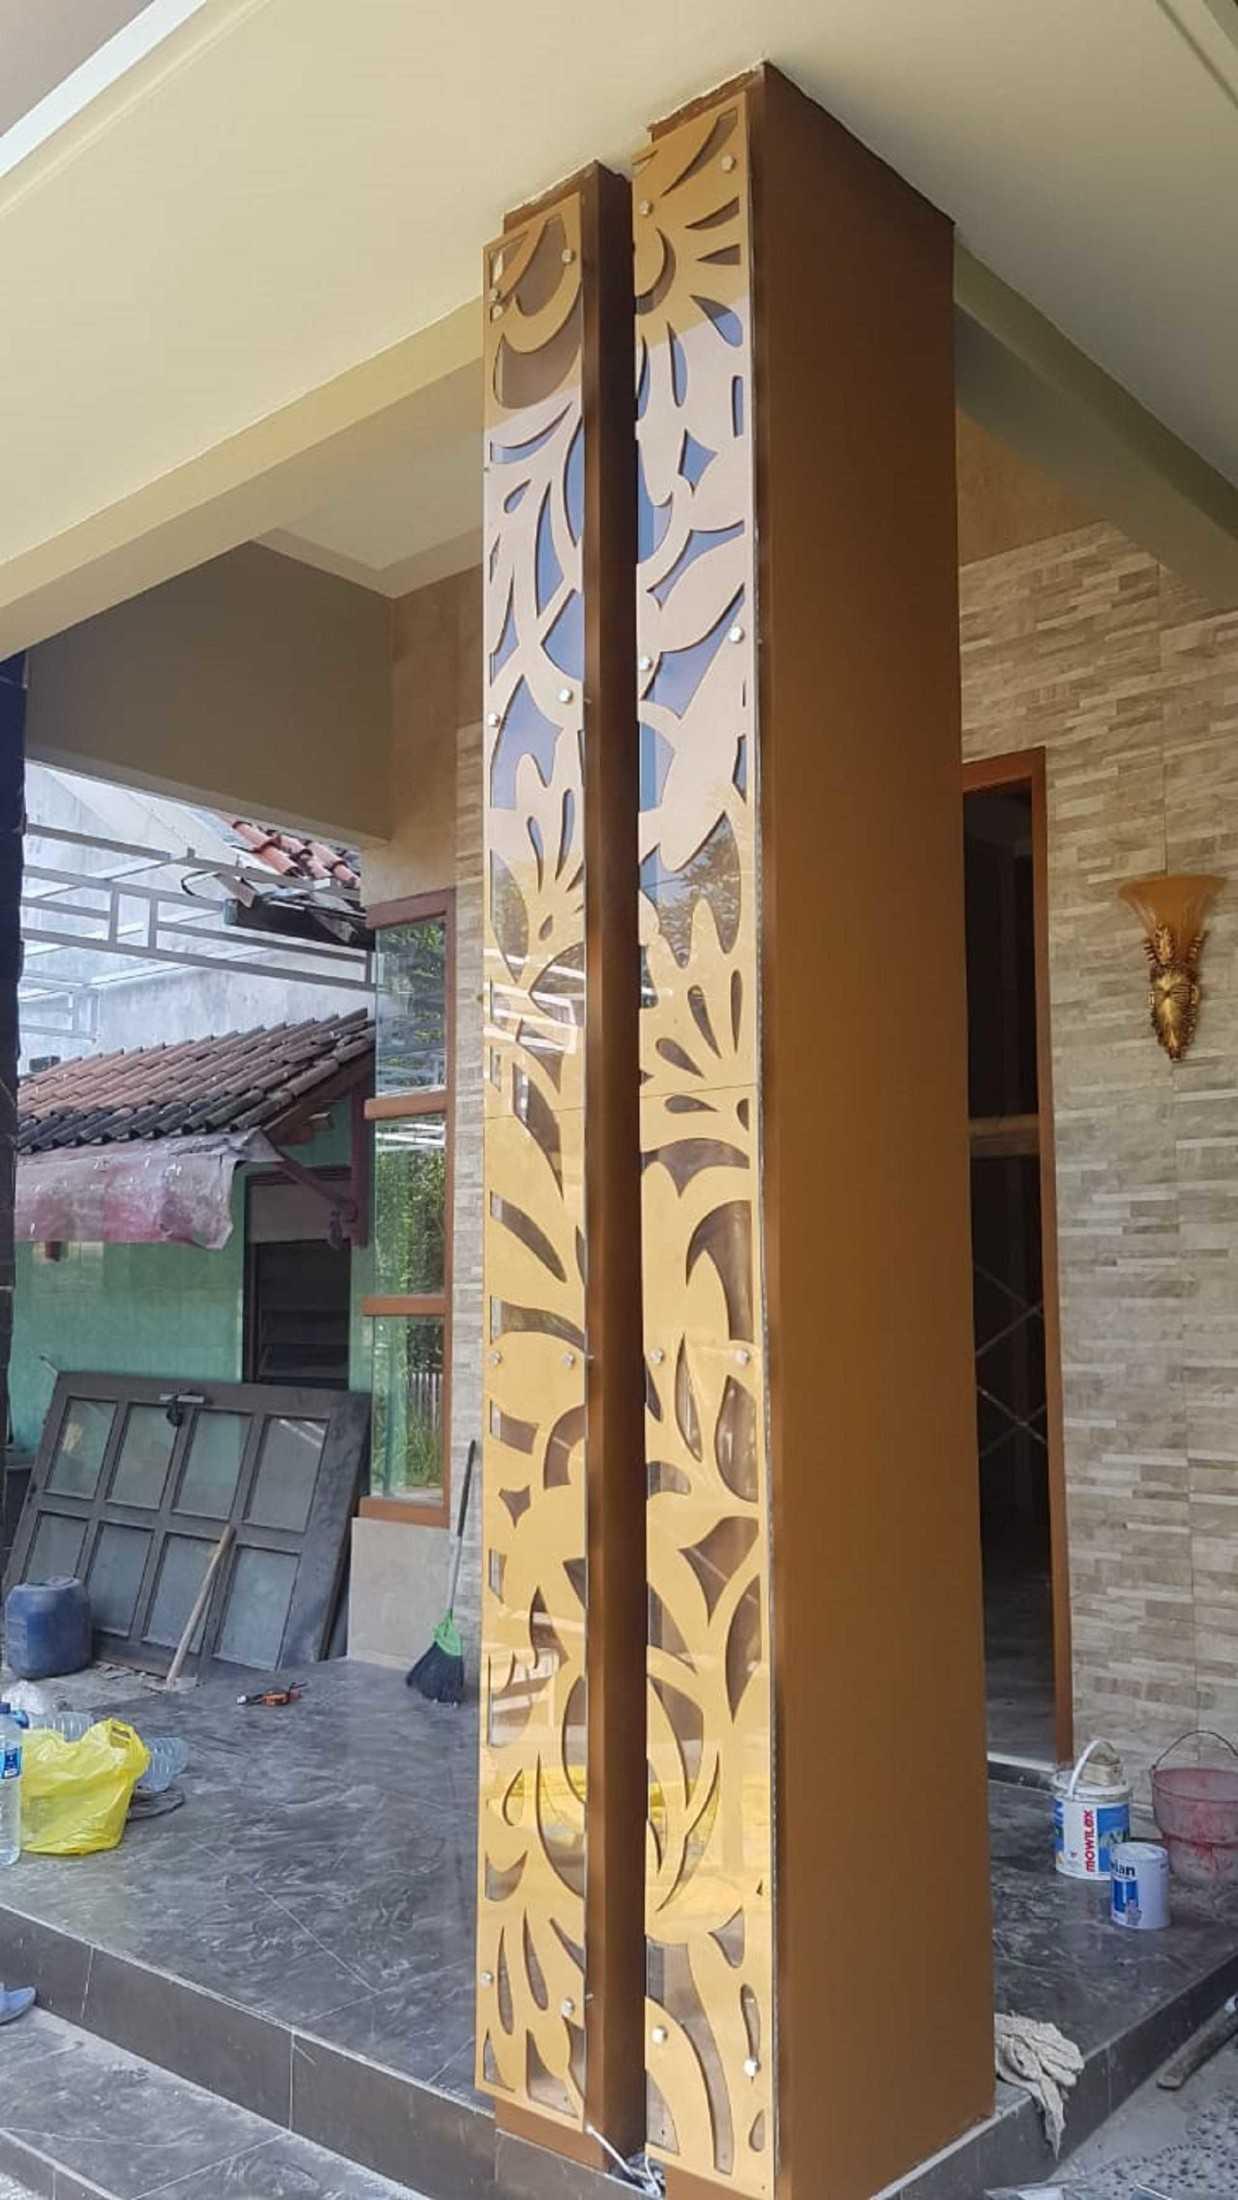 Rekoo Indonesia Acryclic Fasad & Interior Pati, Kec. Pati, Kabupaten Pati, Jawa Tengah, Indonesia Pati, Kec. Pati, Kabupaten Pati, Jawa Tengah, Indonesia Rekoo-Indonesia-Acryclic-Fasad-Interior  133286